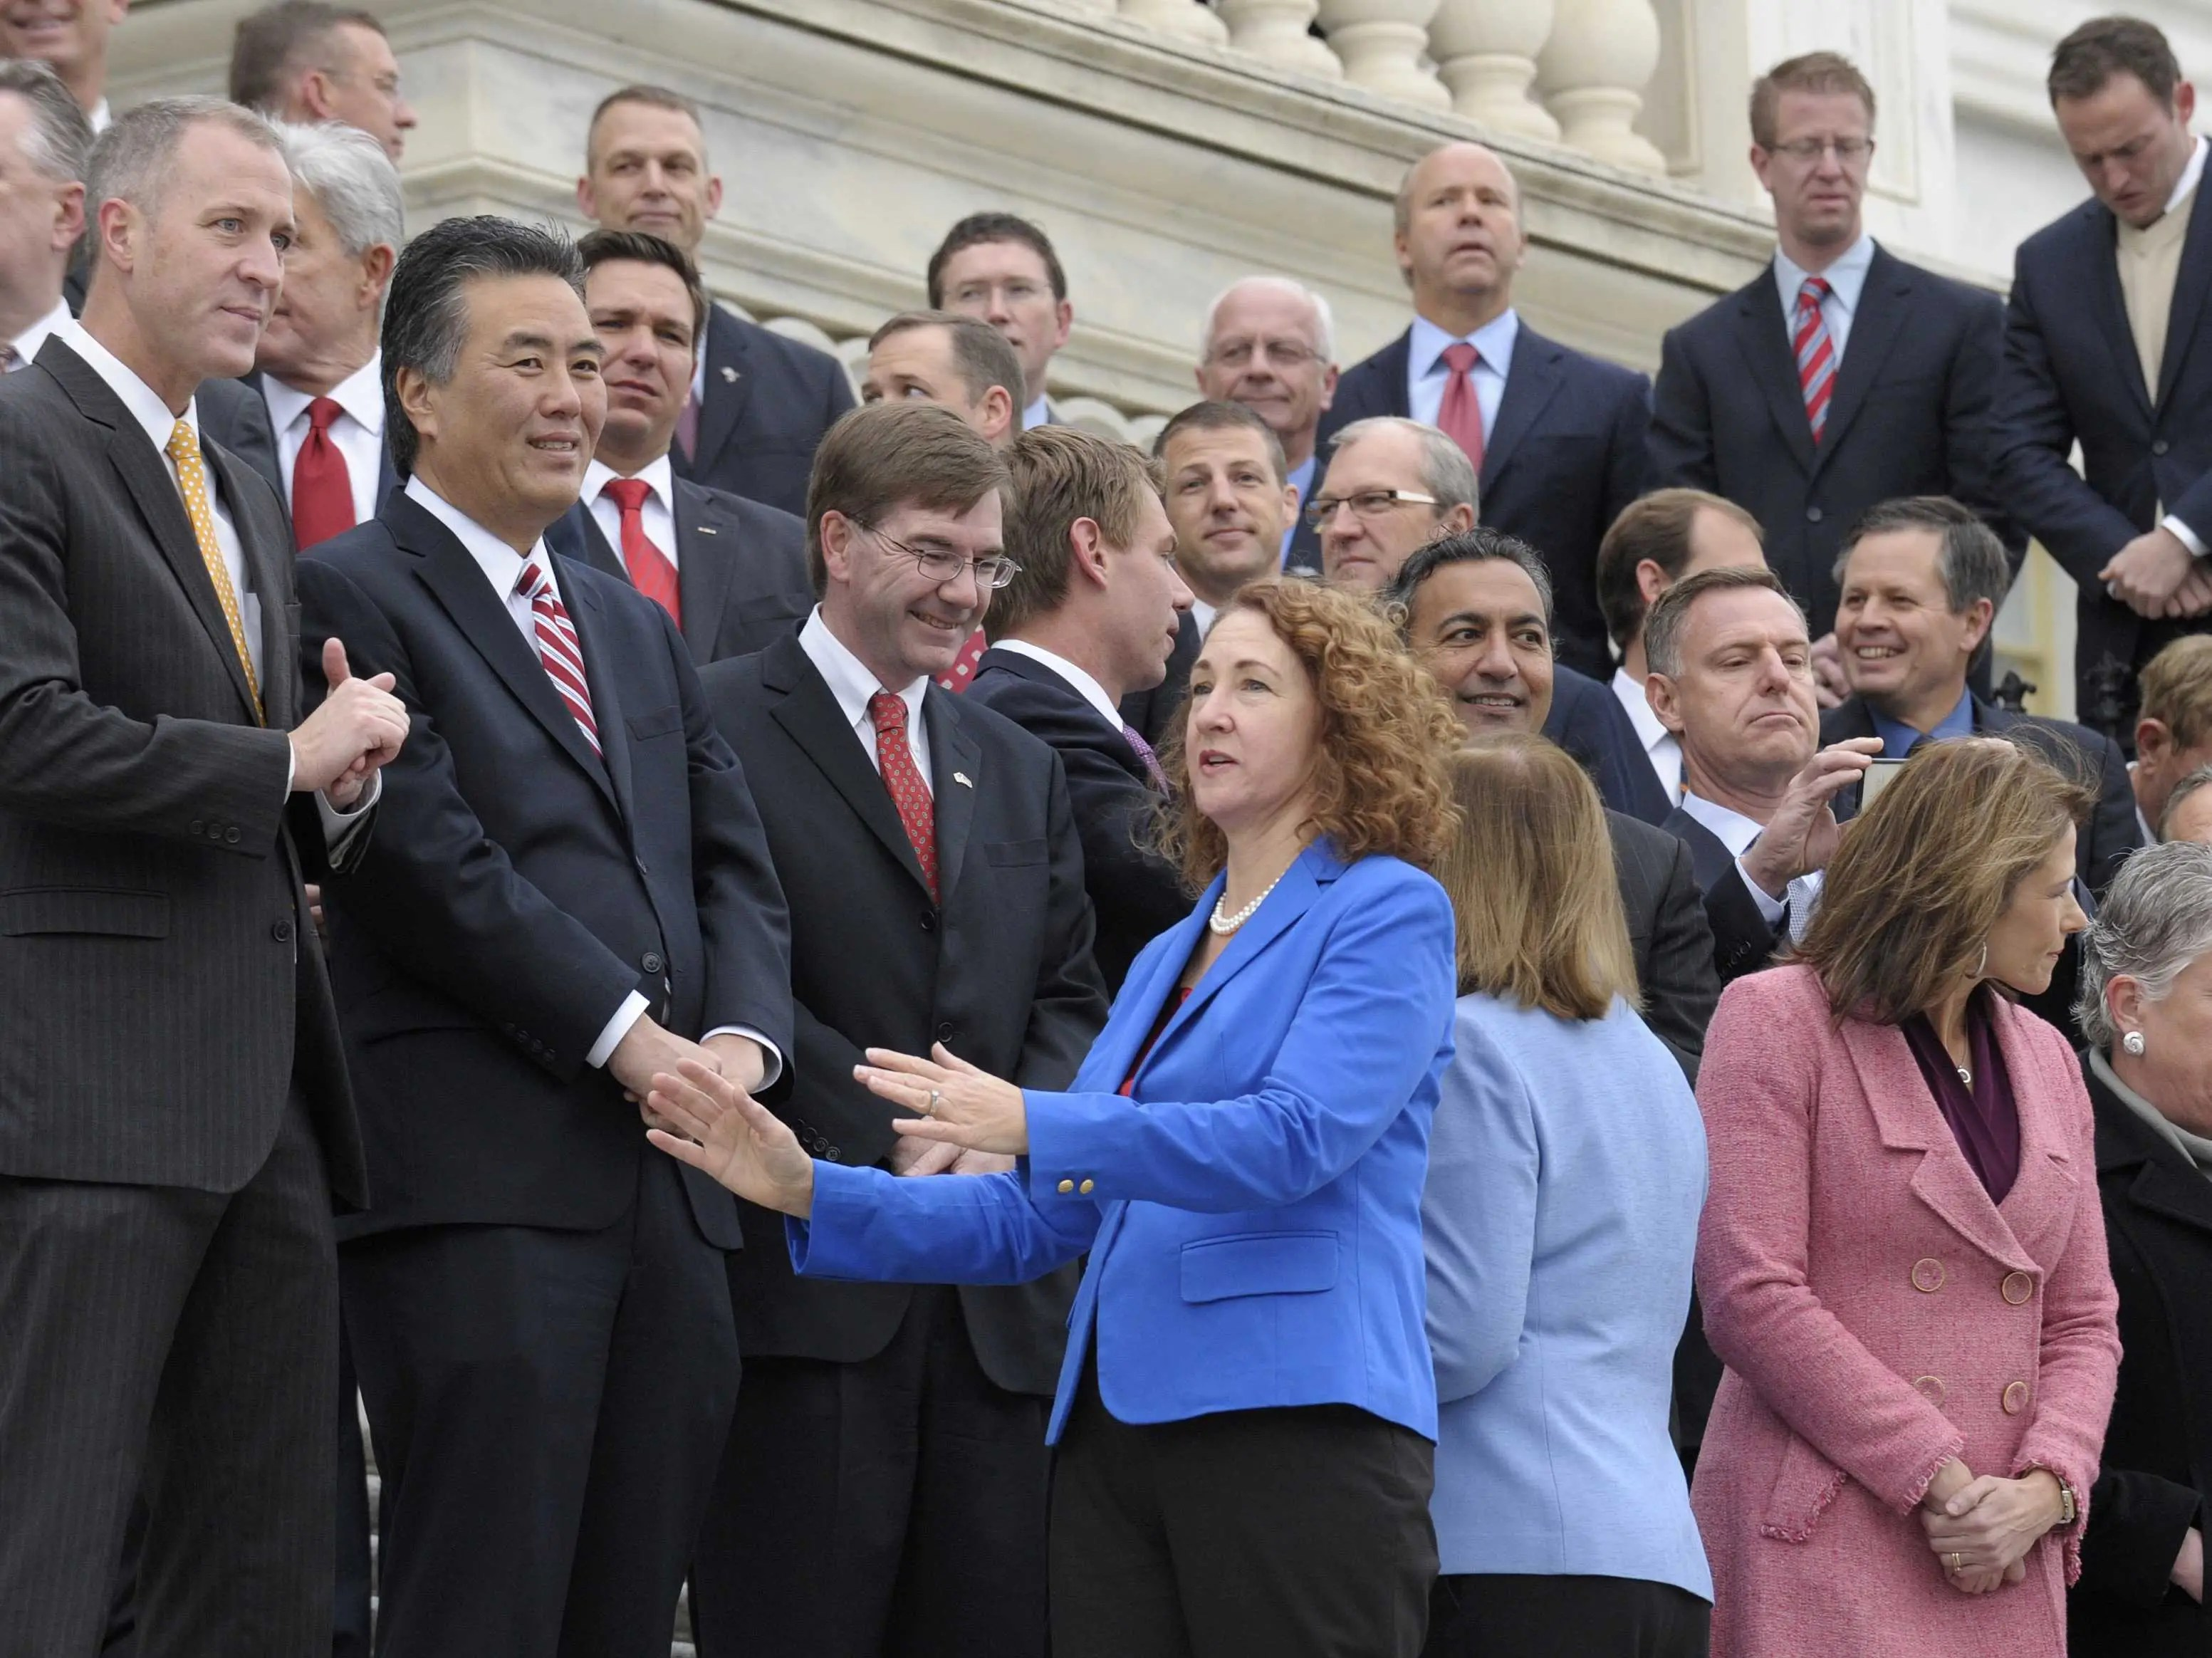 Congress is 18% female.